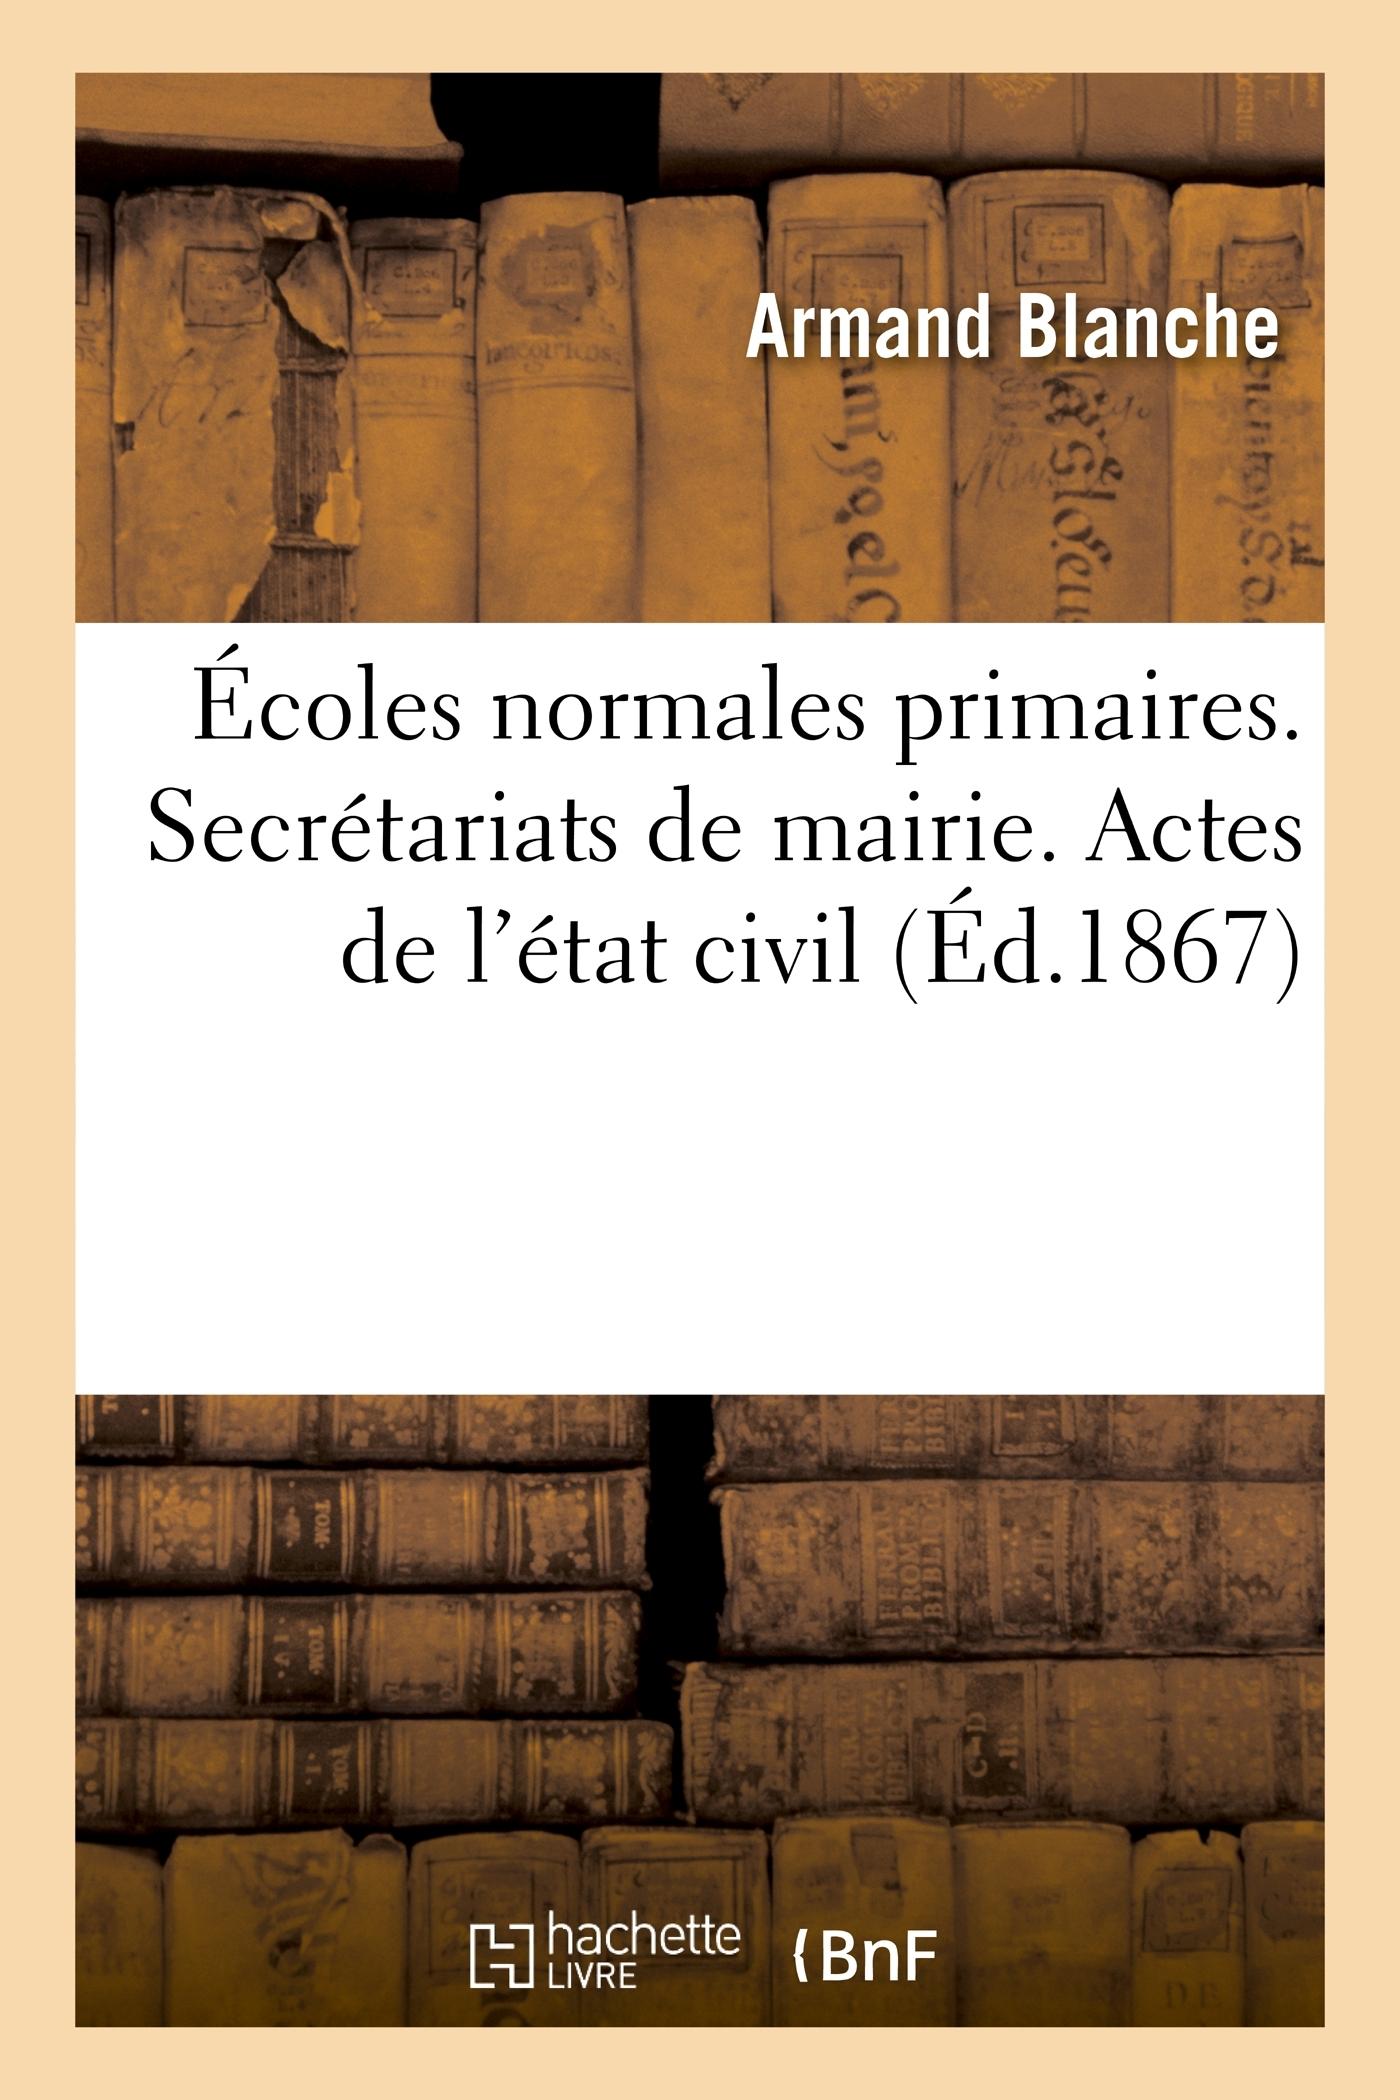 ECOLES NORMALES PRIMAIRES. SECRETARIATS DE MAIRIE. ACTES DE L'ETAT CIVIL, MATIERES USUELLES